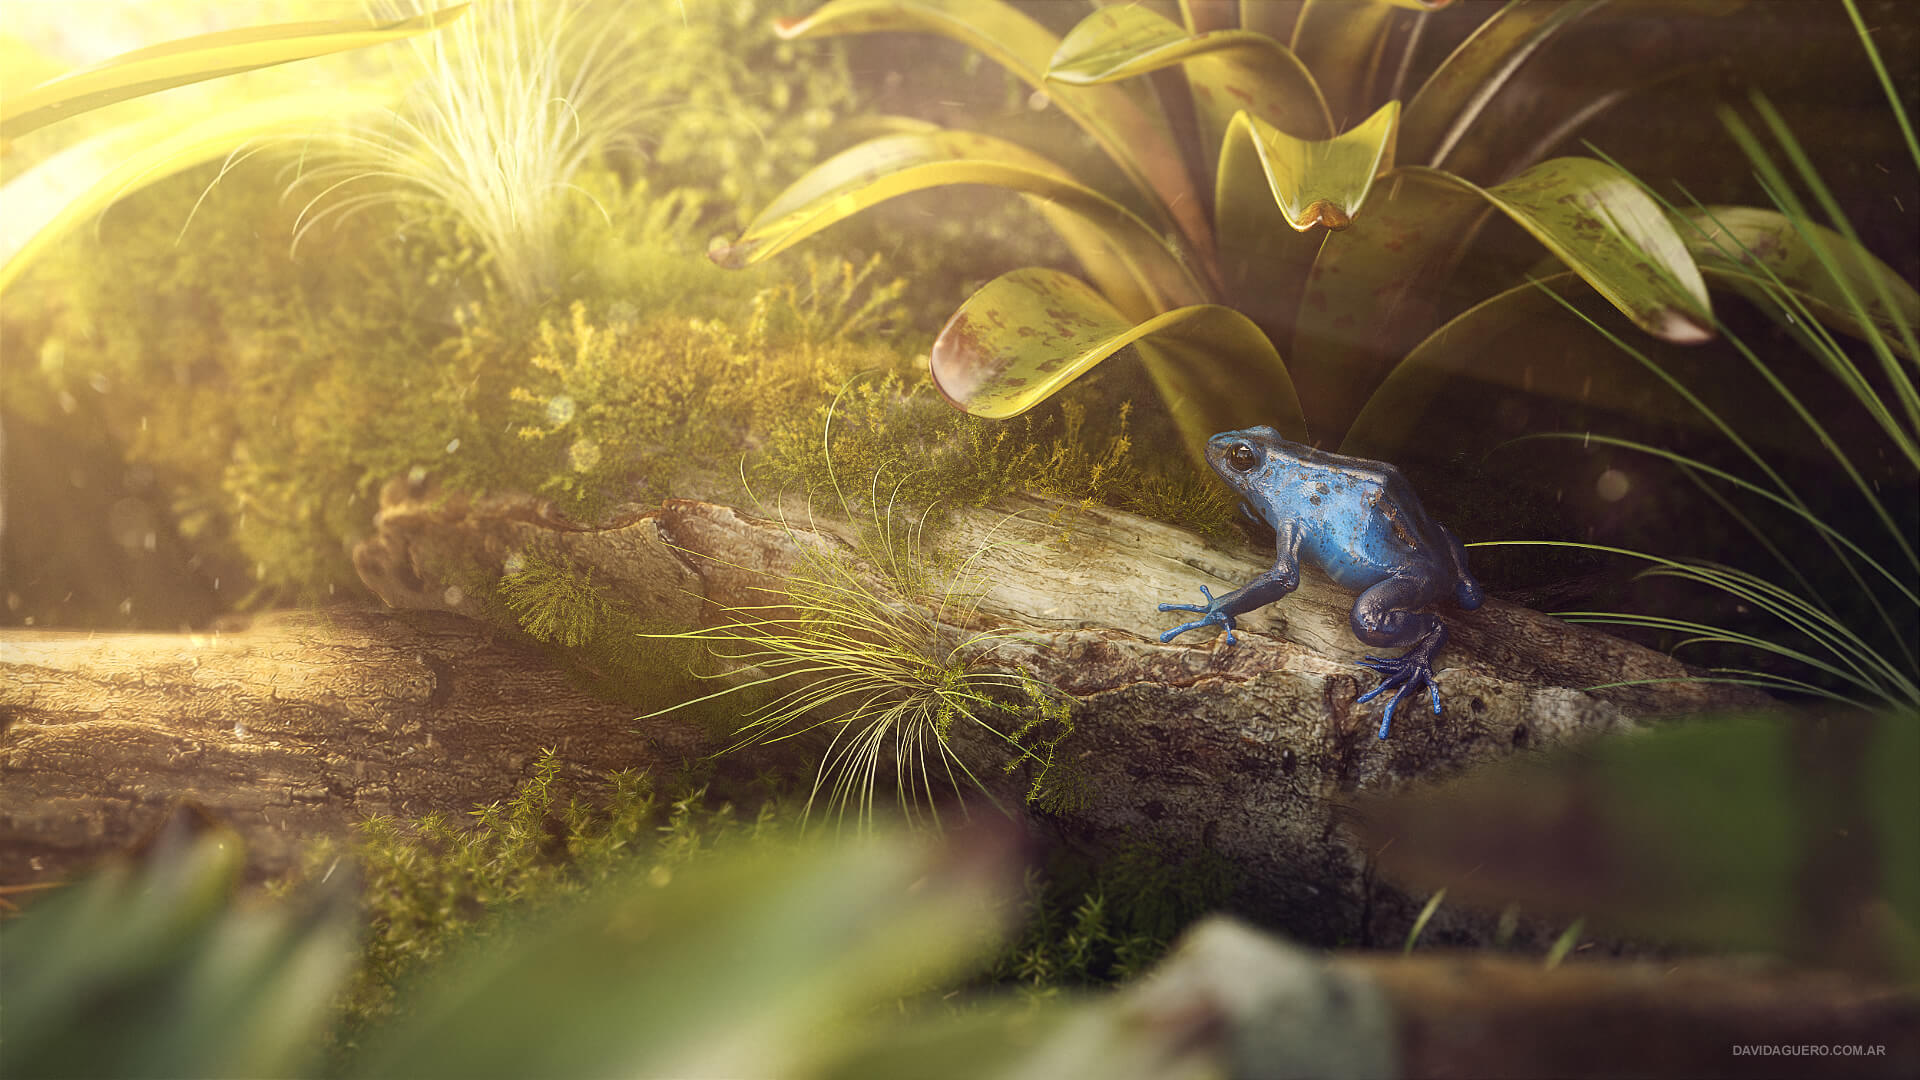 David Aguero realistic frog